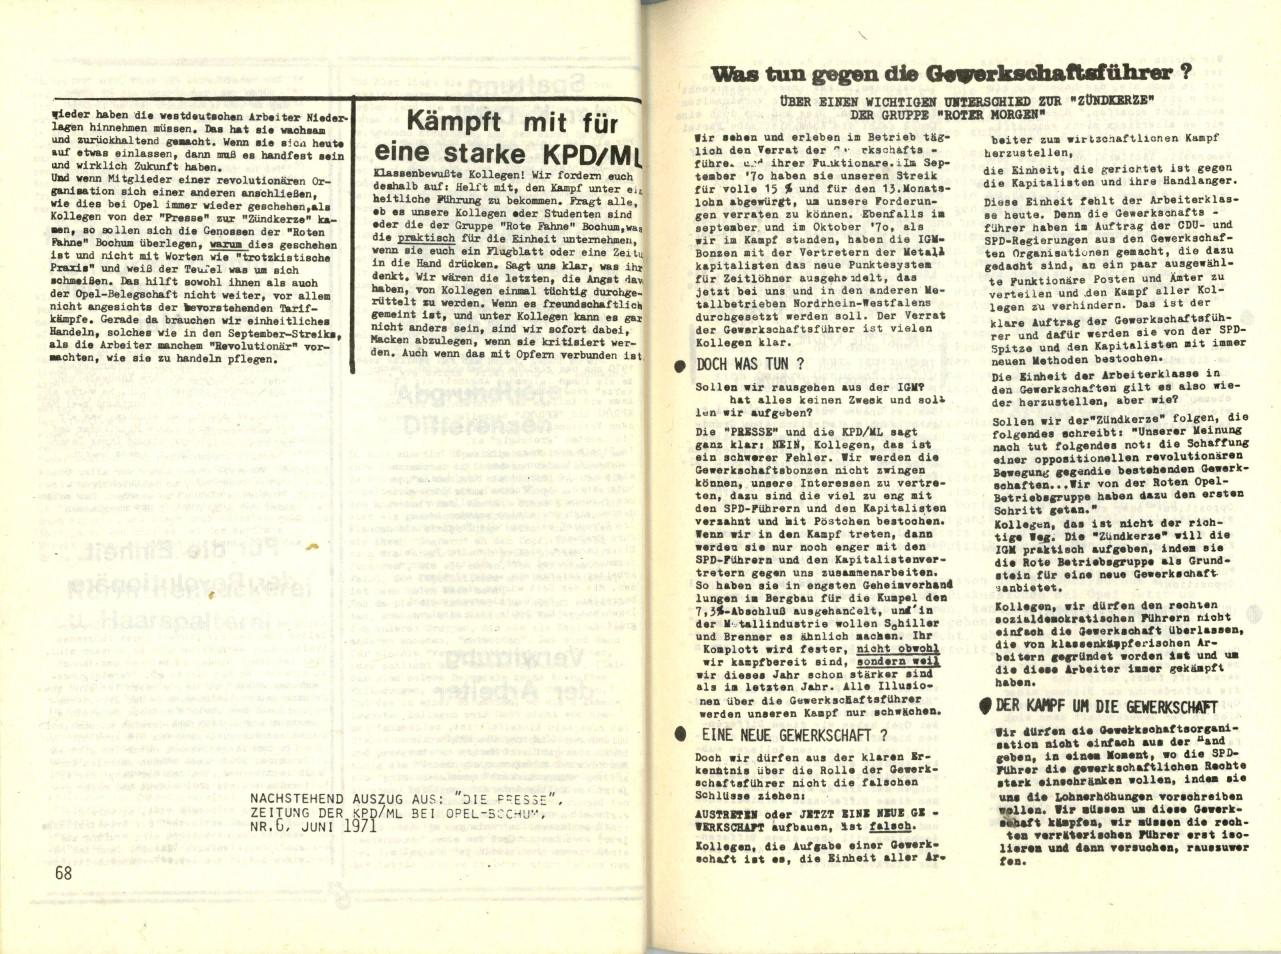 ZB_Parteiarbeiter_1971_06_36